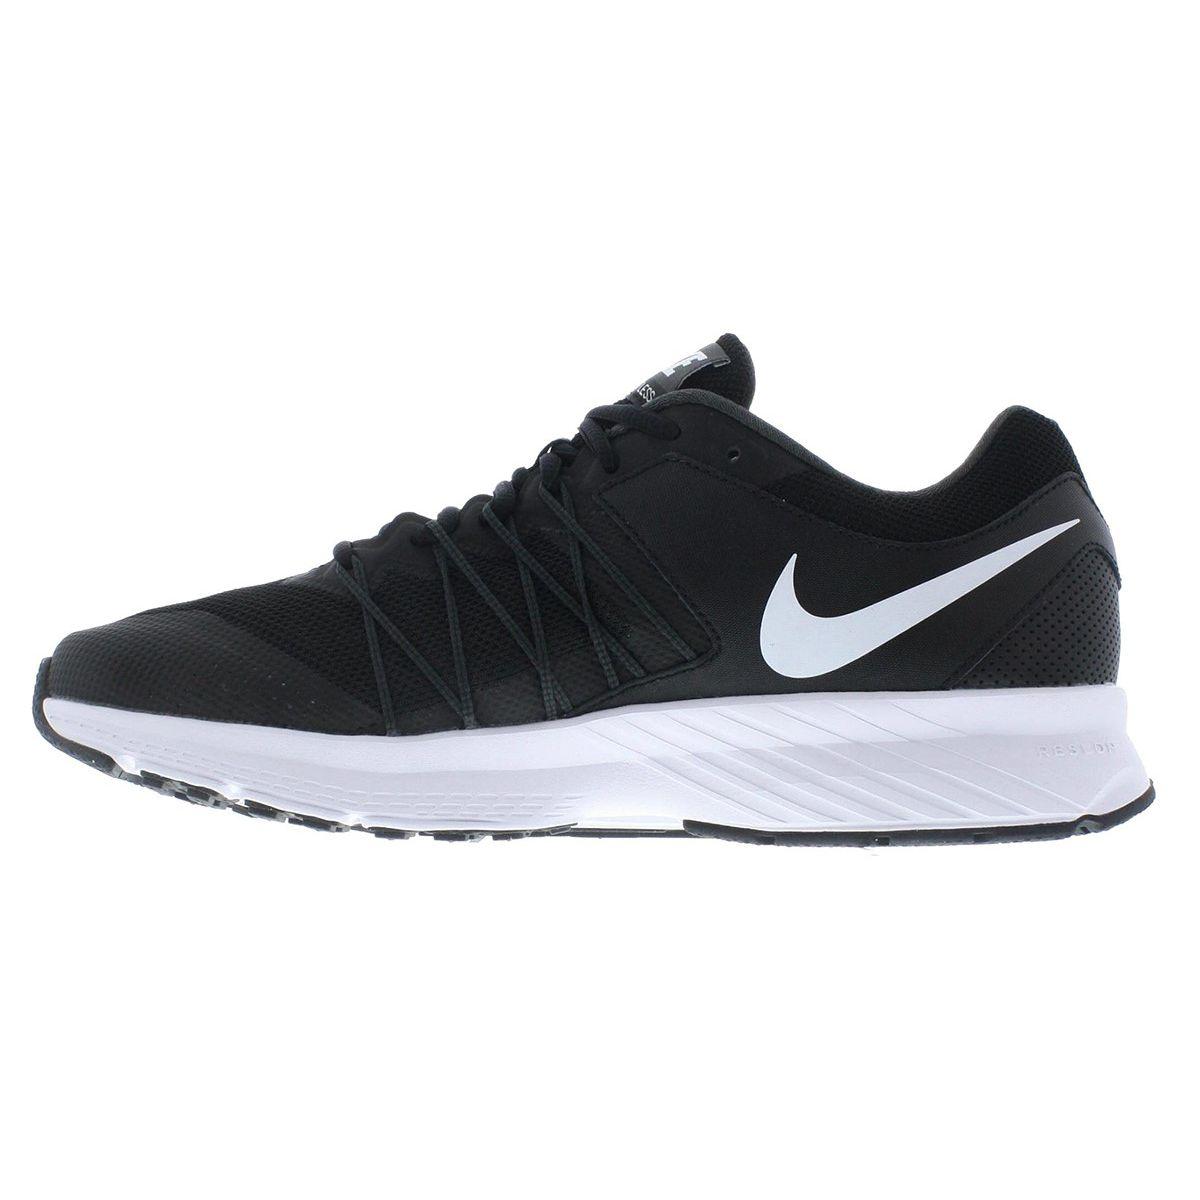 Nike Air Relentless 6 Koşu Ayakkabısı 843836001